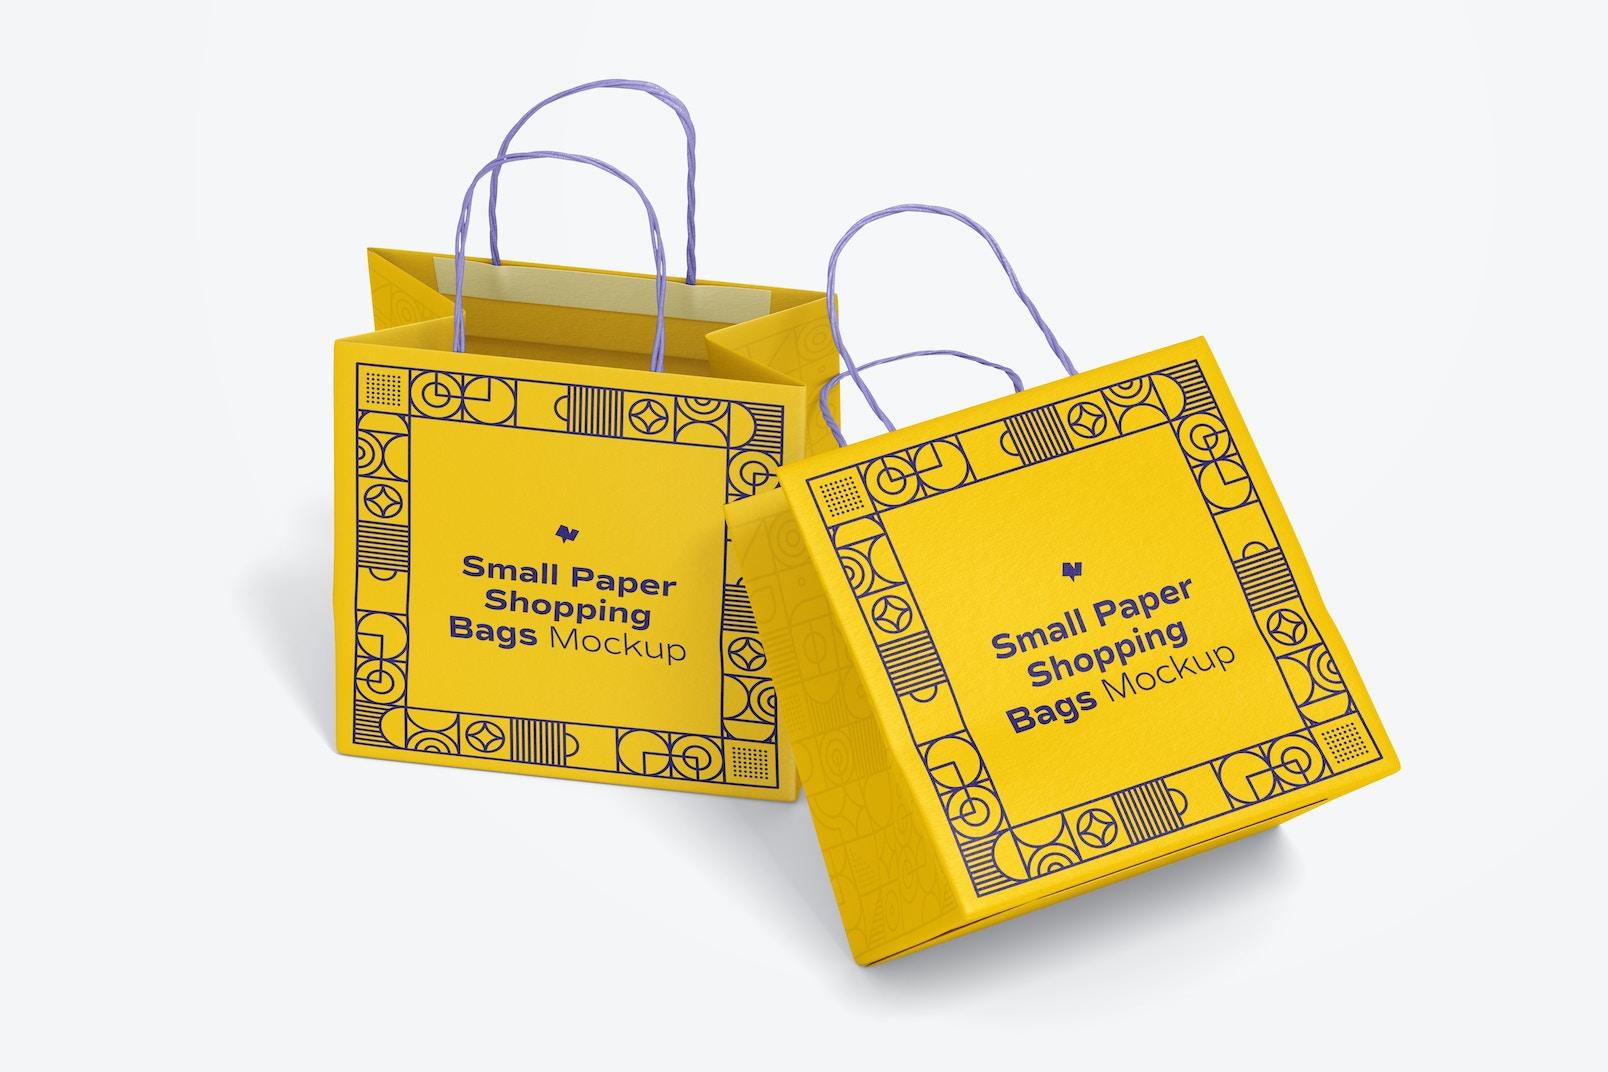 Small Paper Shopping Bags Mockup